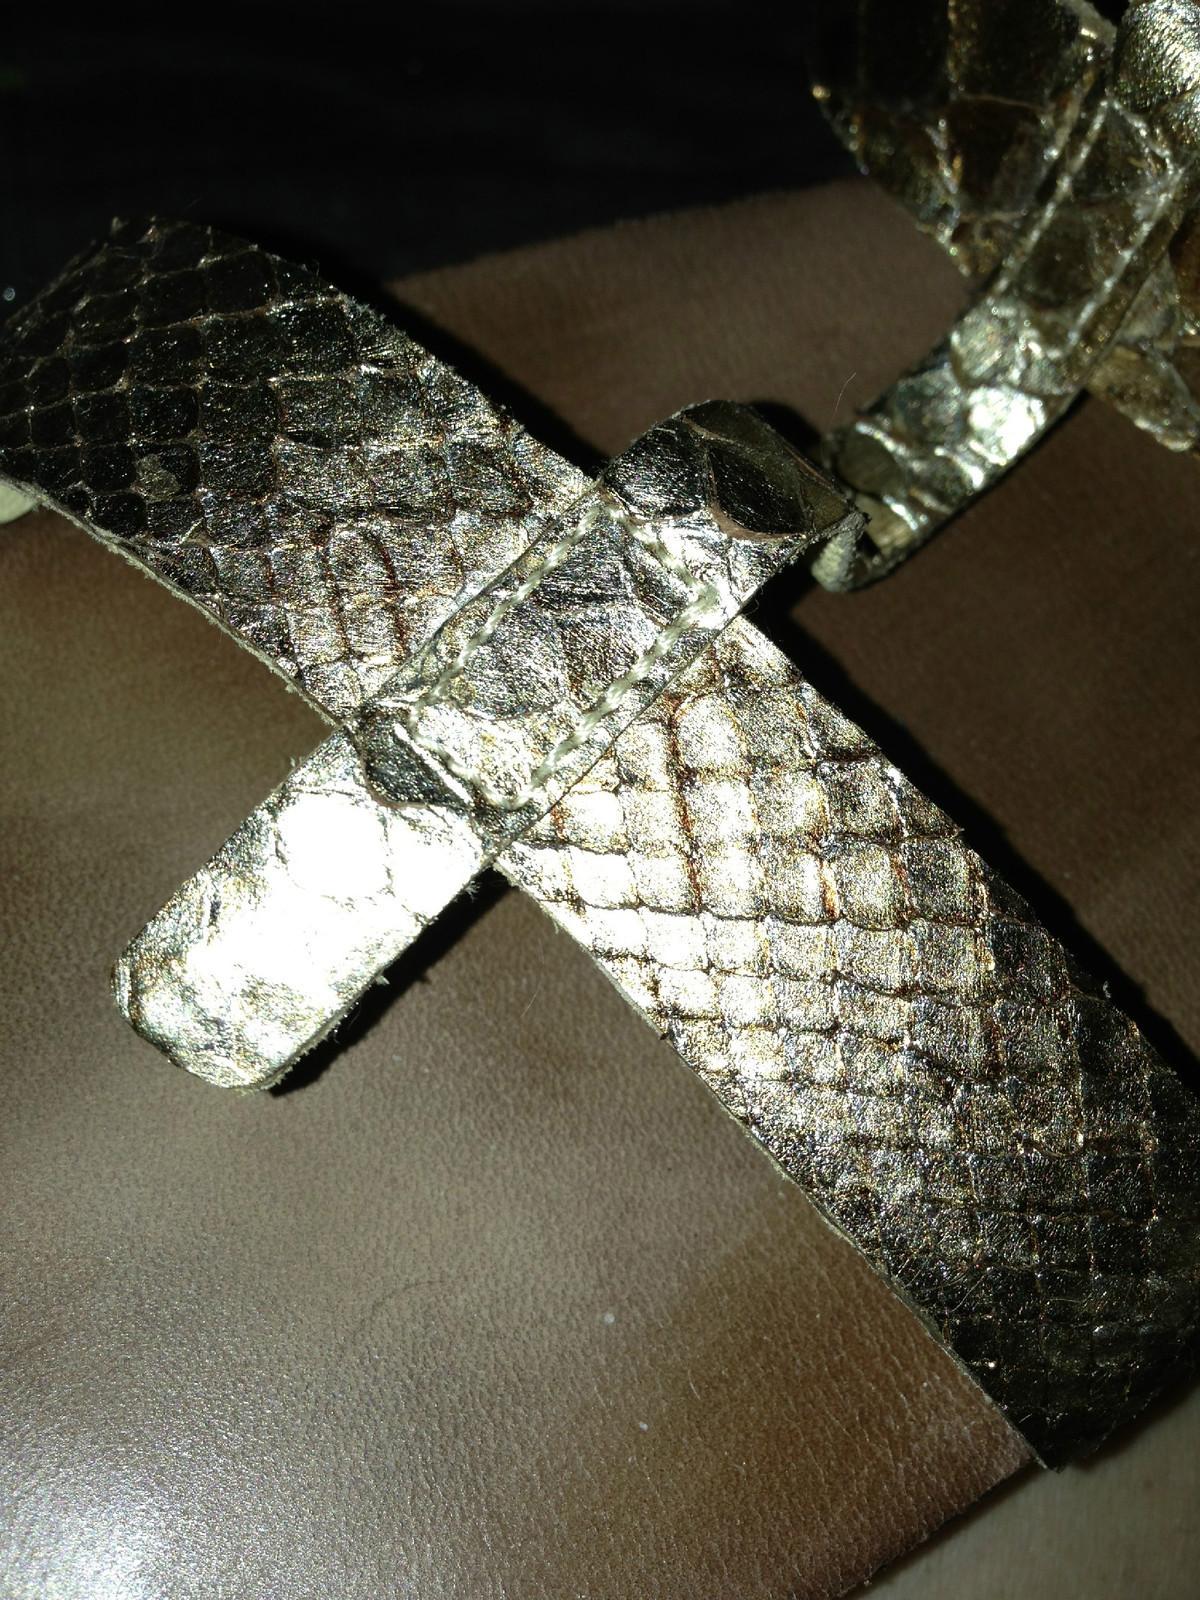 Lanvin HARD TO FIND Python Flats Metallic gold 41 11 Gladiator  sandals - $174.10